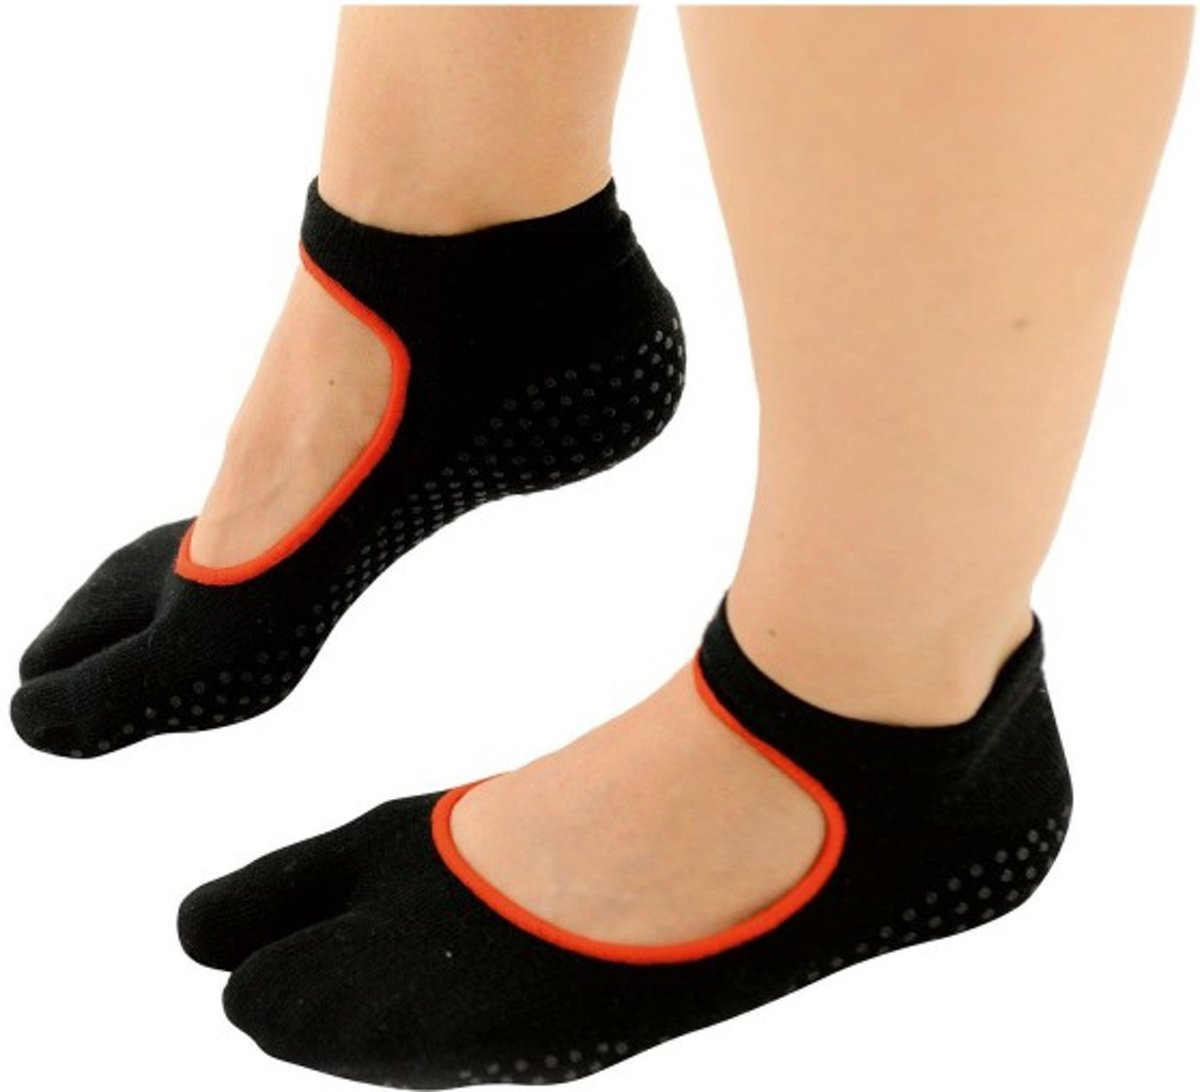 Sissel Pilates één teen antislip sokken - Maat Large/X-Large (40-45) kopen